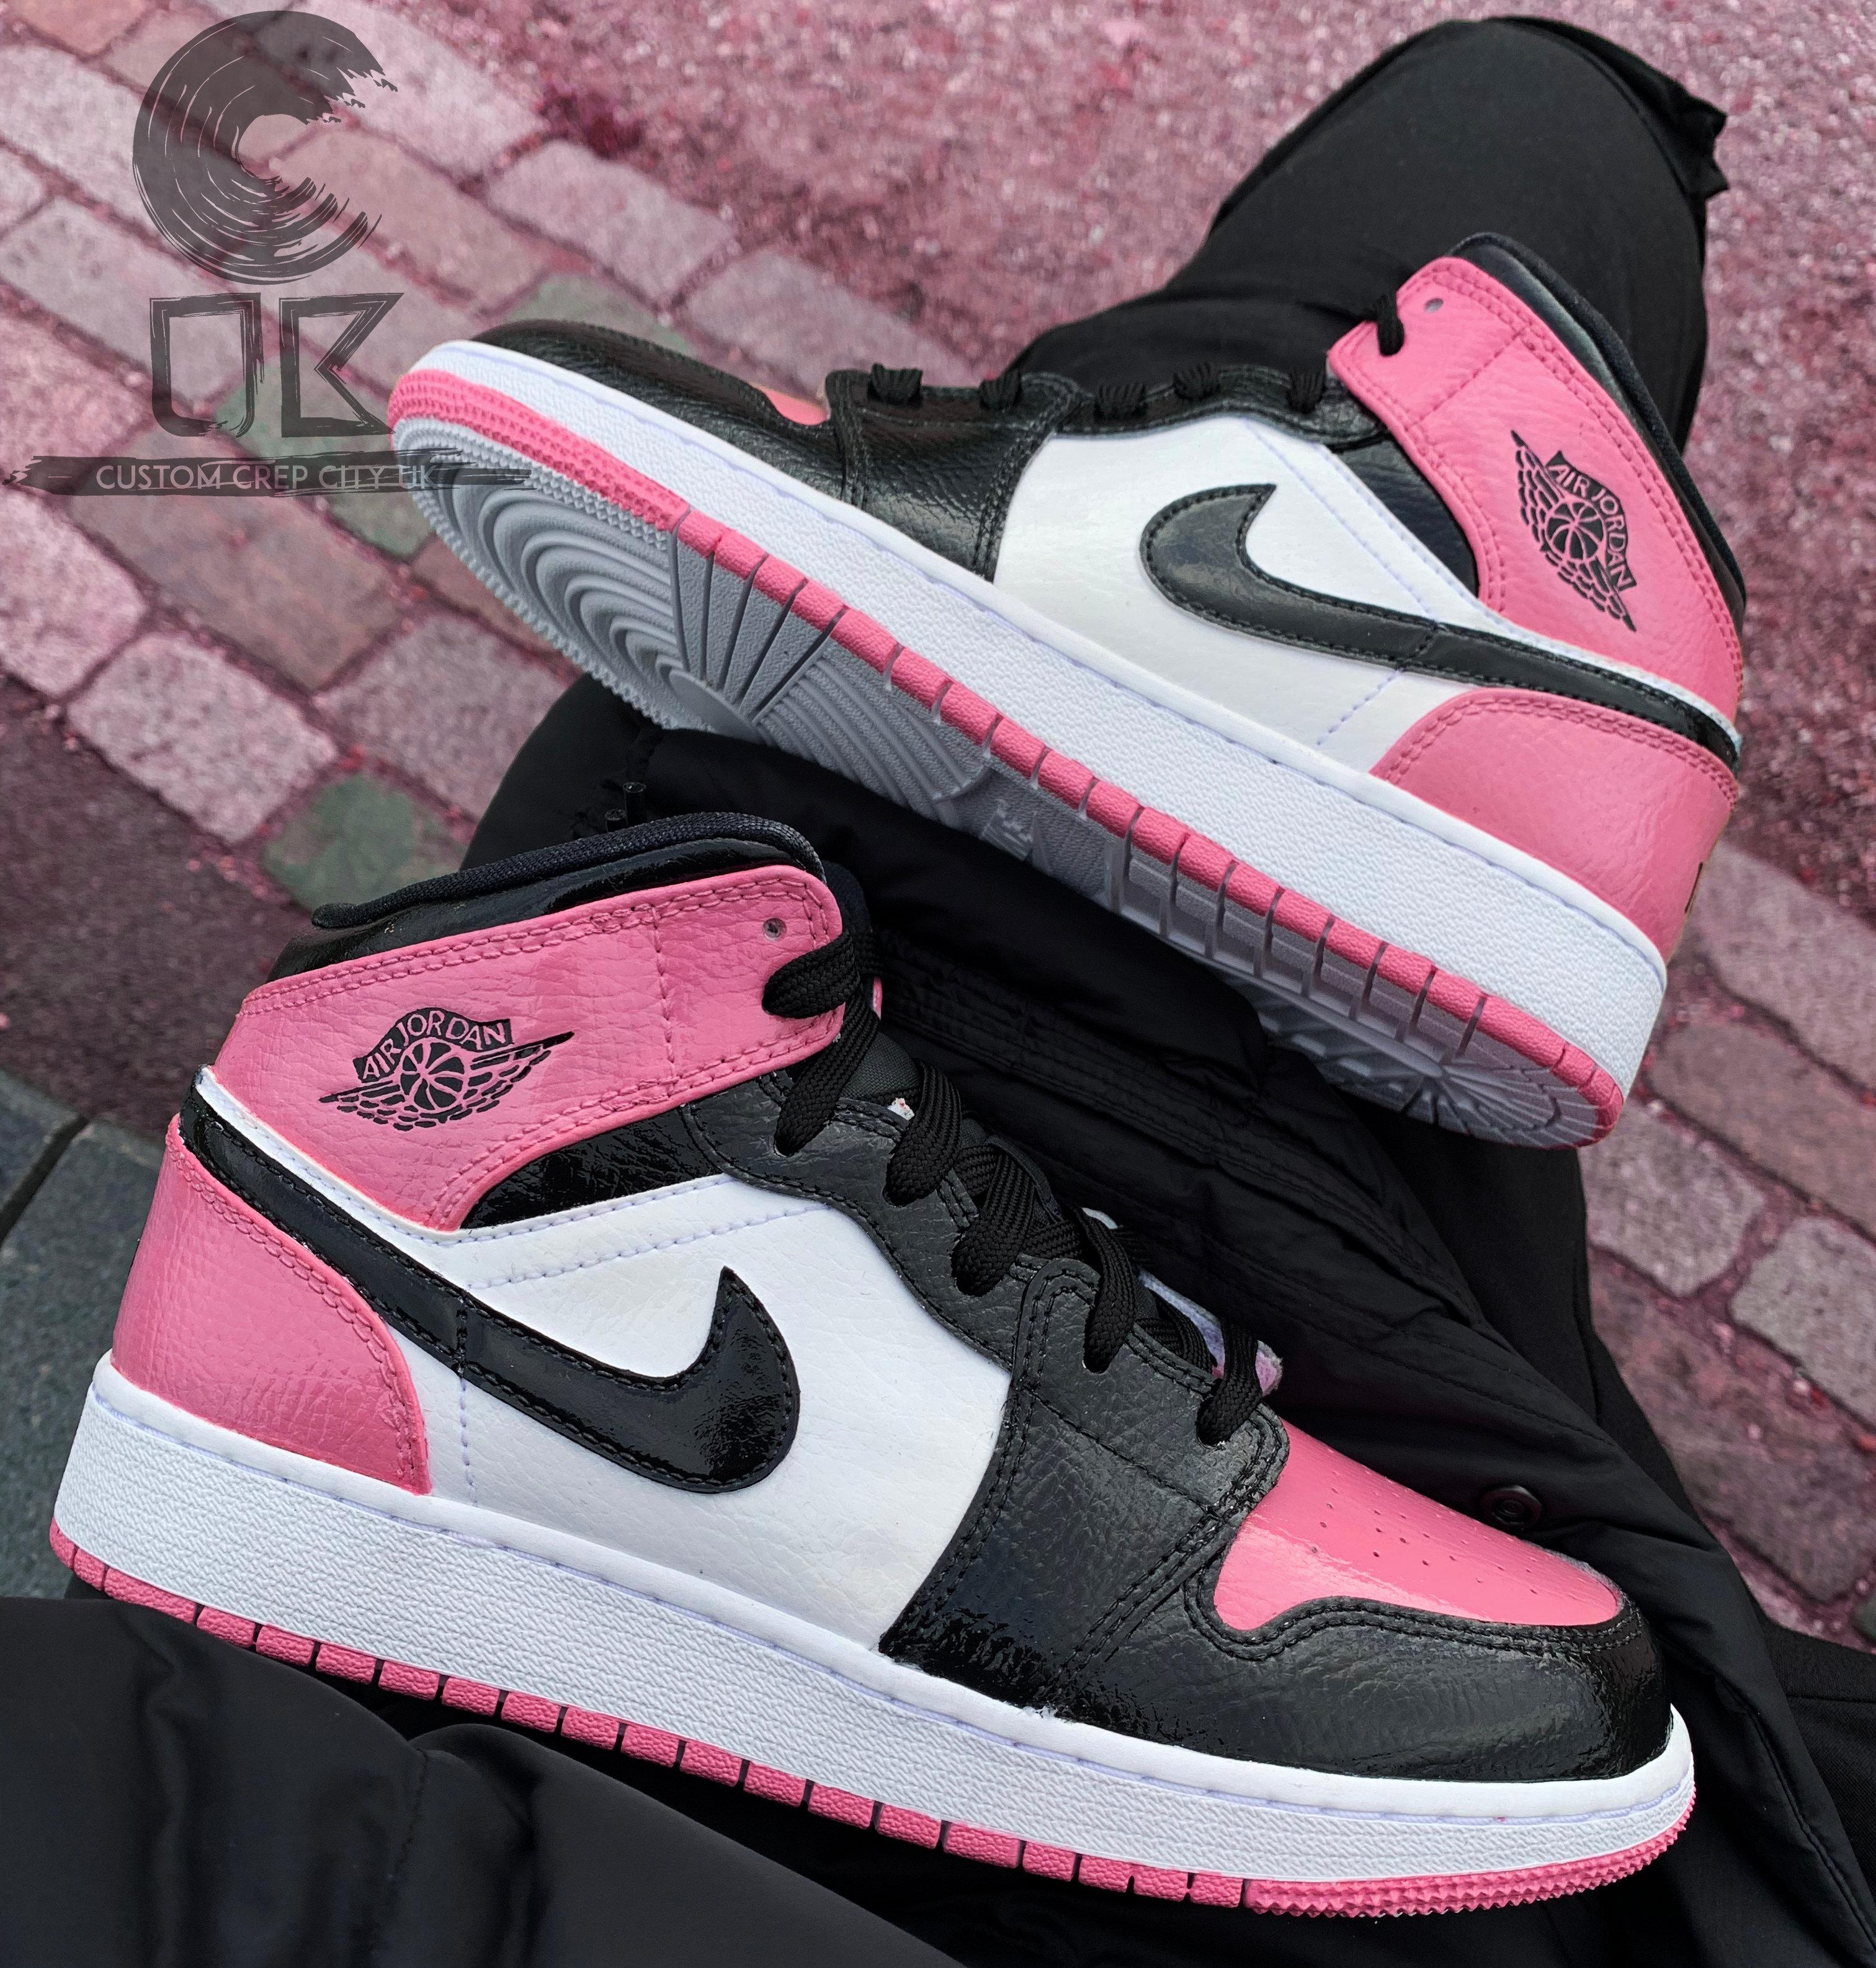 Custom Air Jordan 1 Mid (Pink \u0026 Black